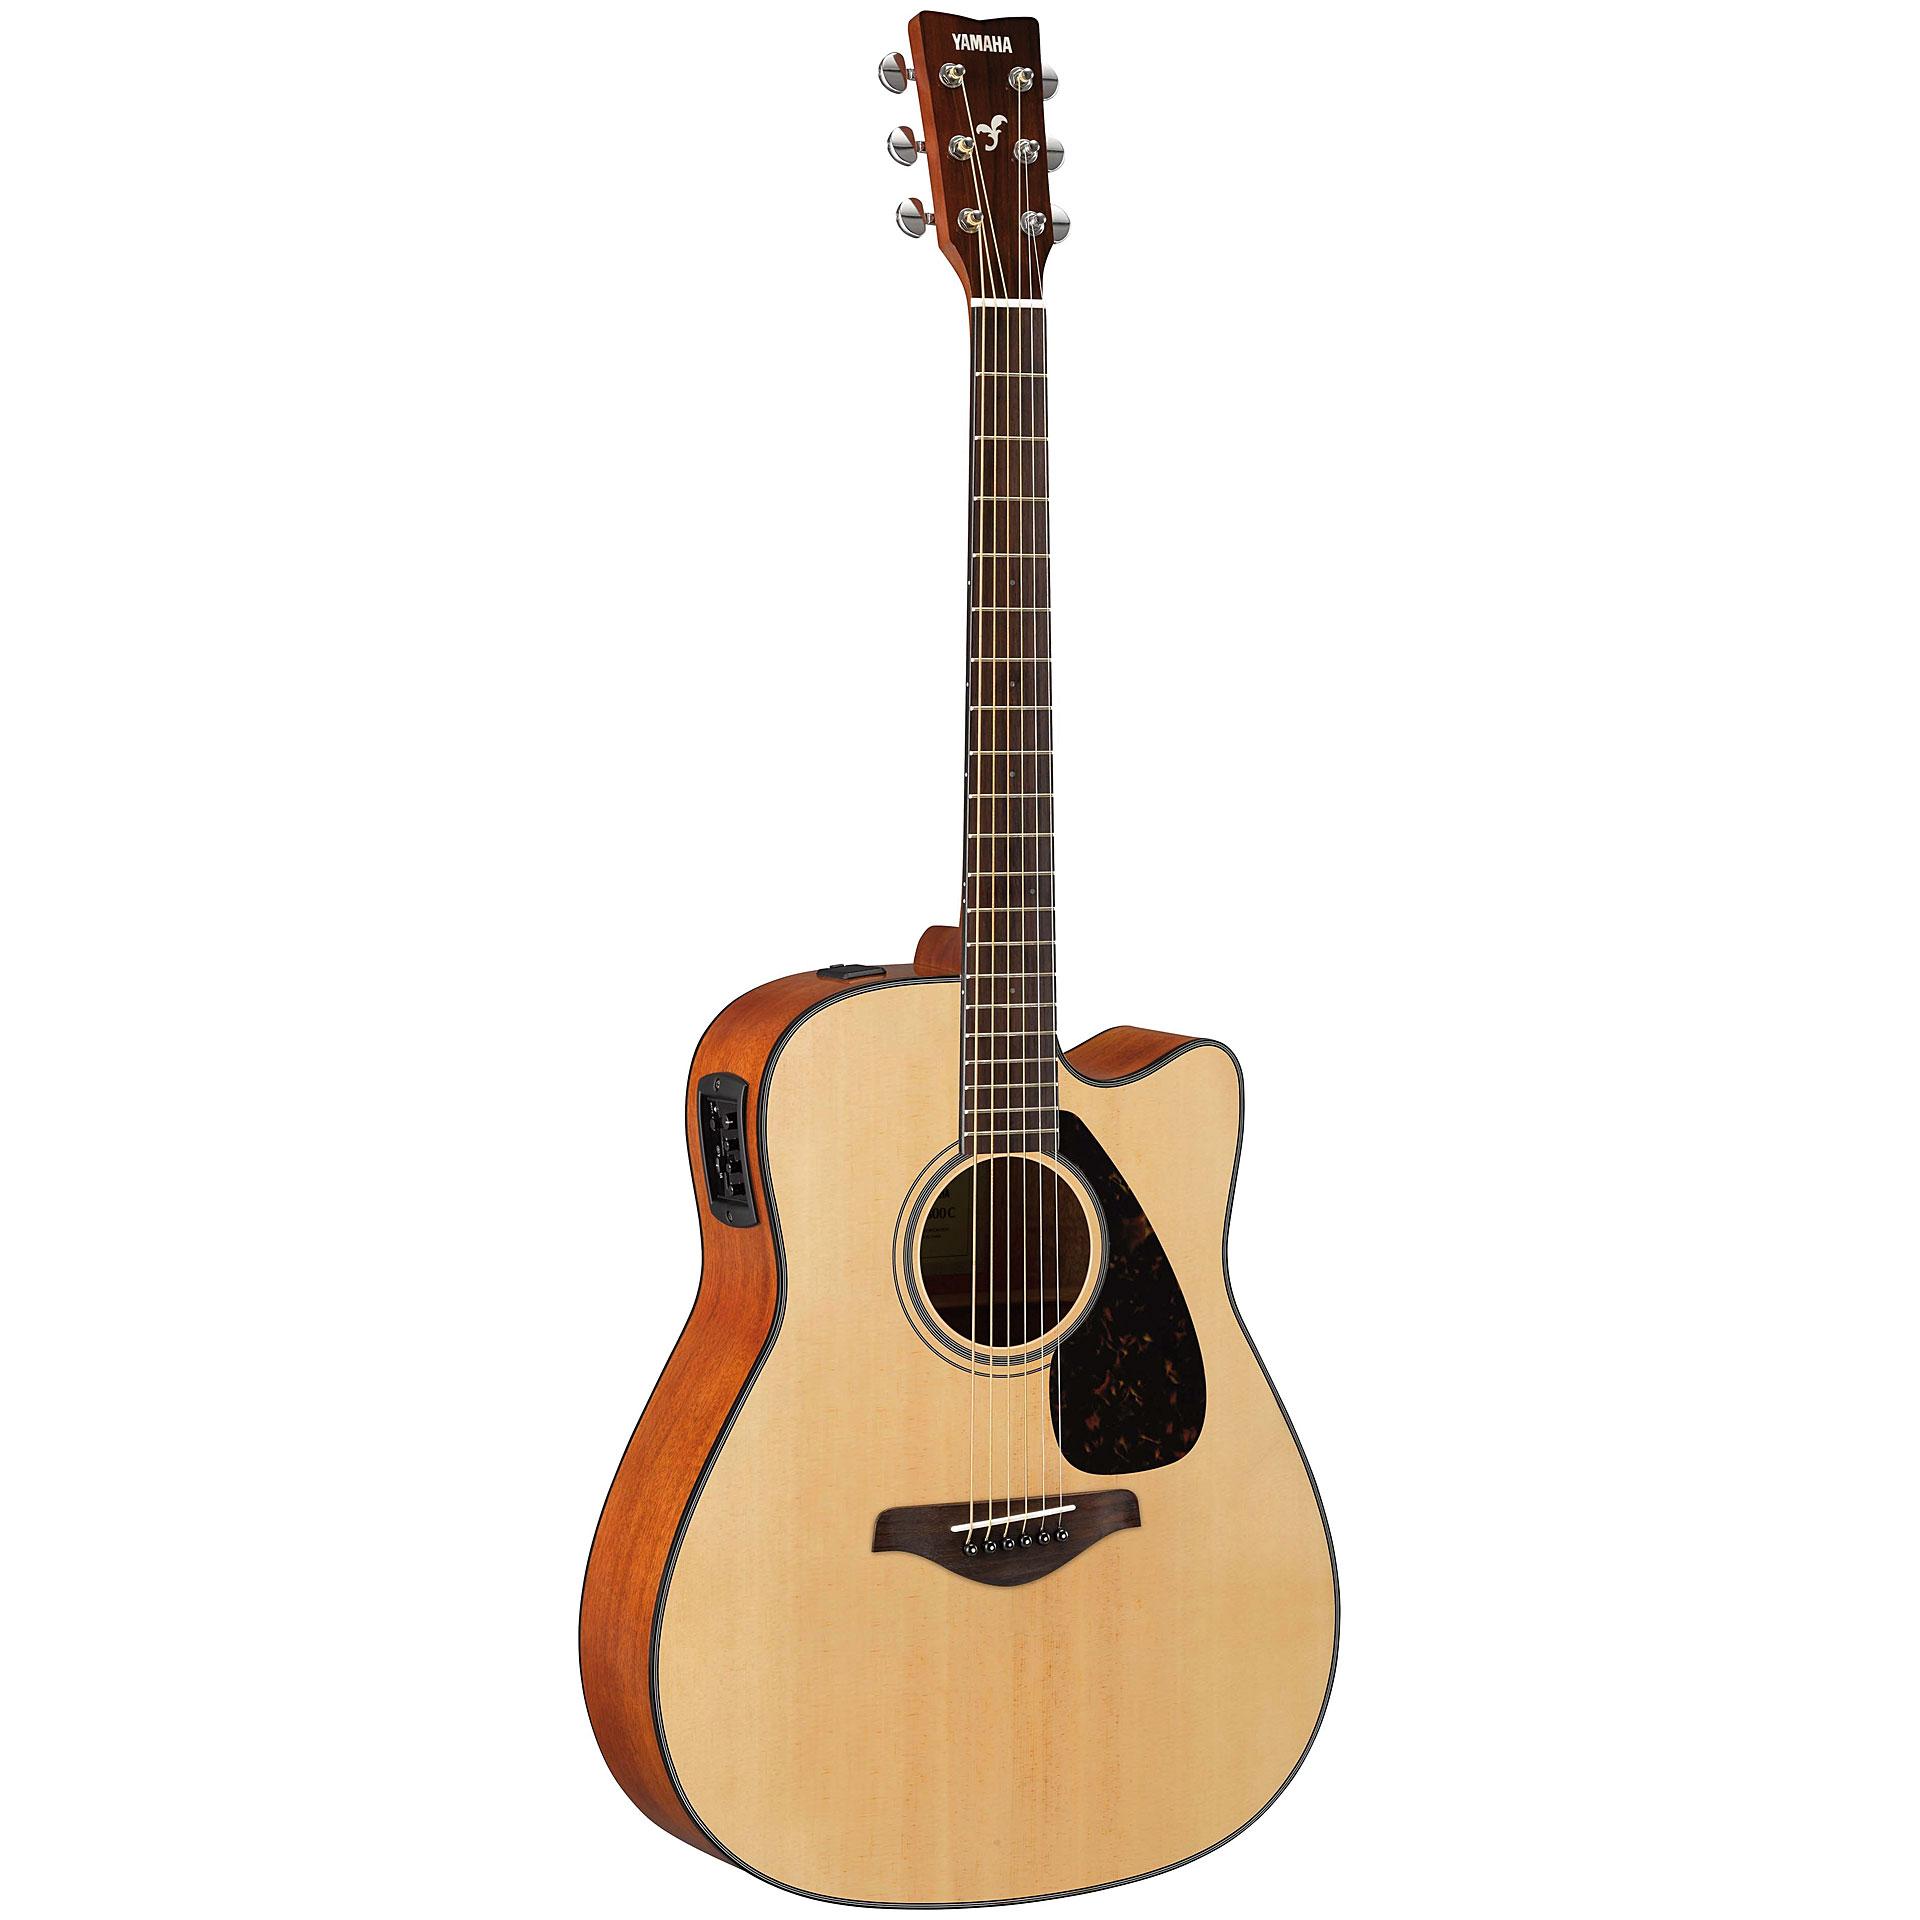 Yamaha Fgx C  String